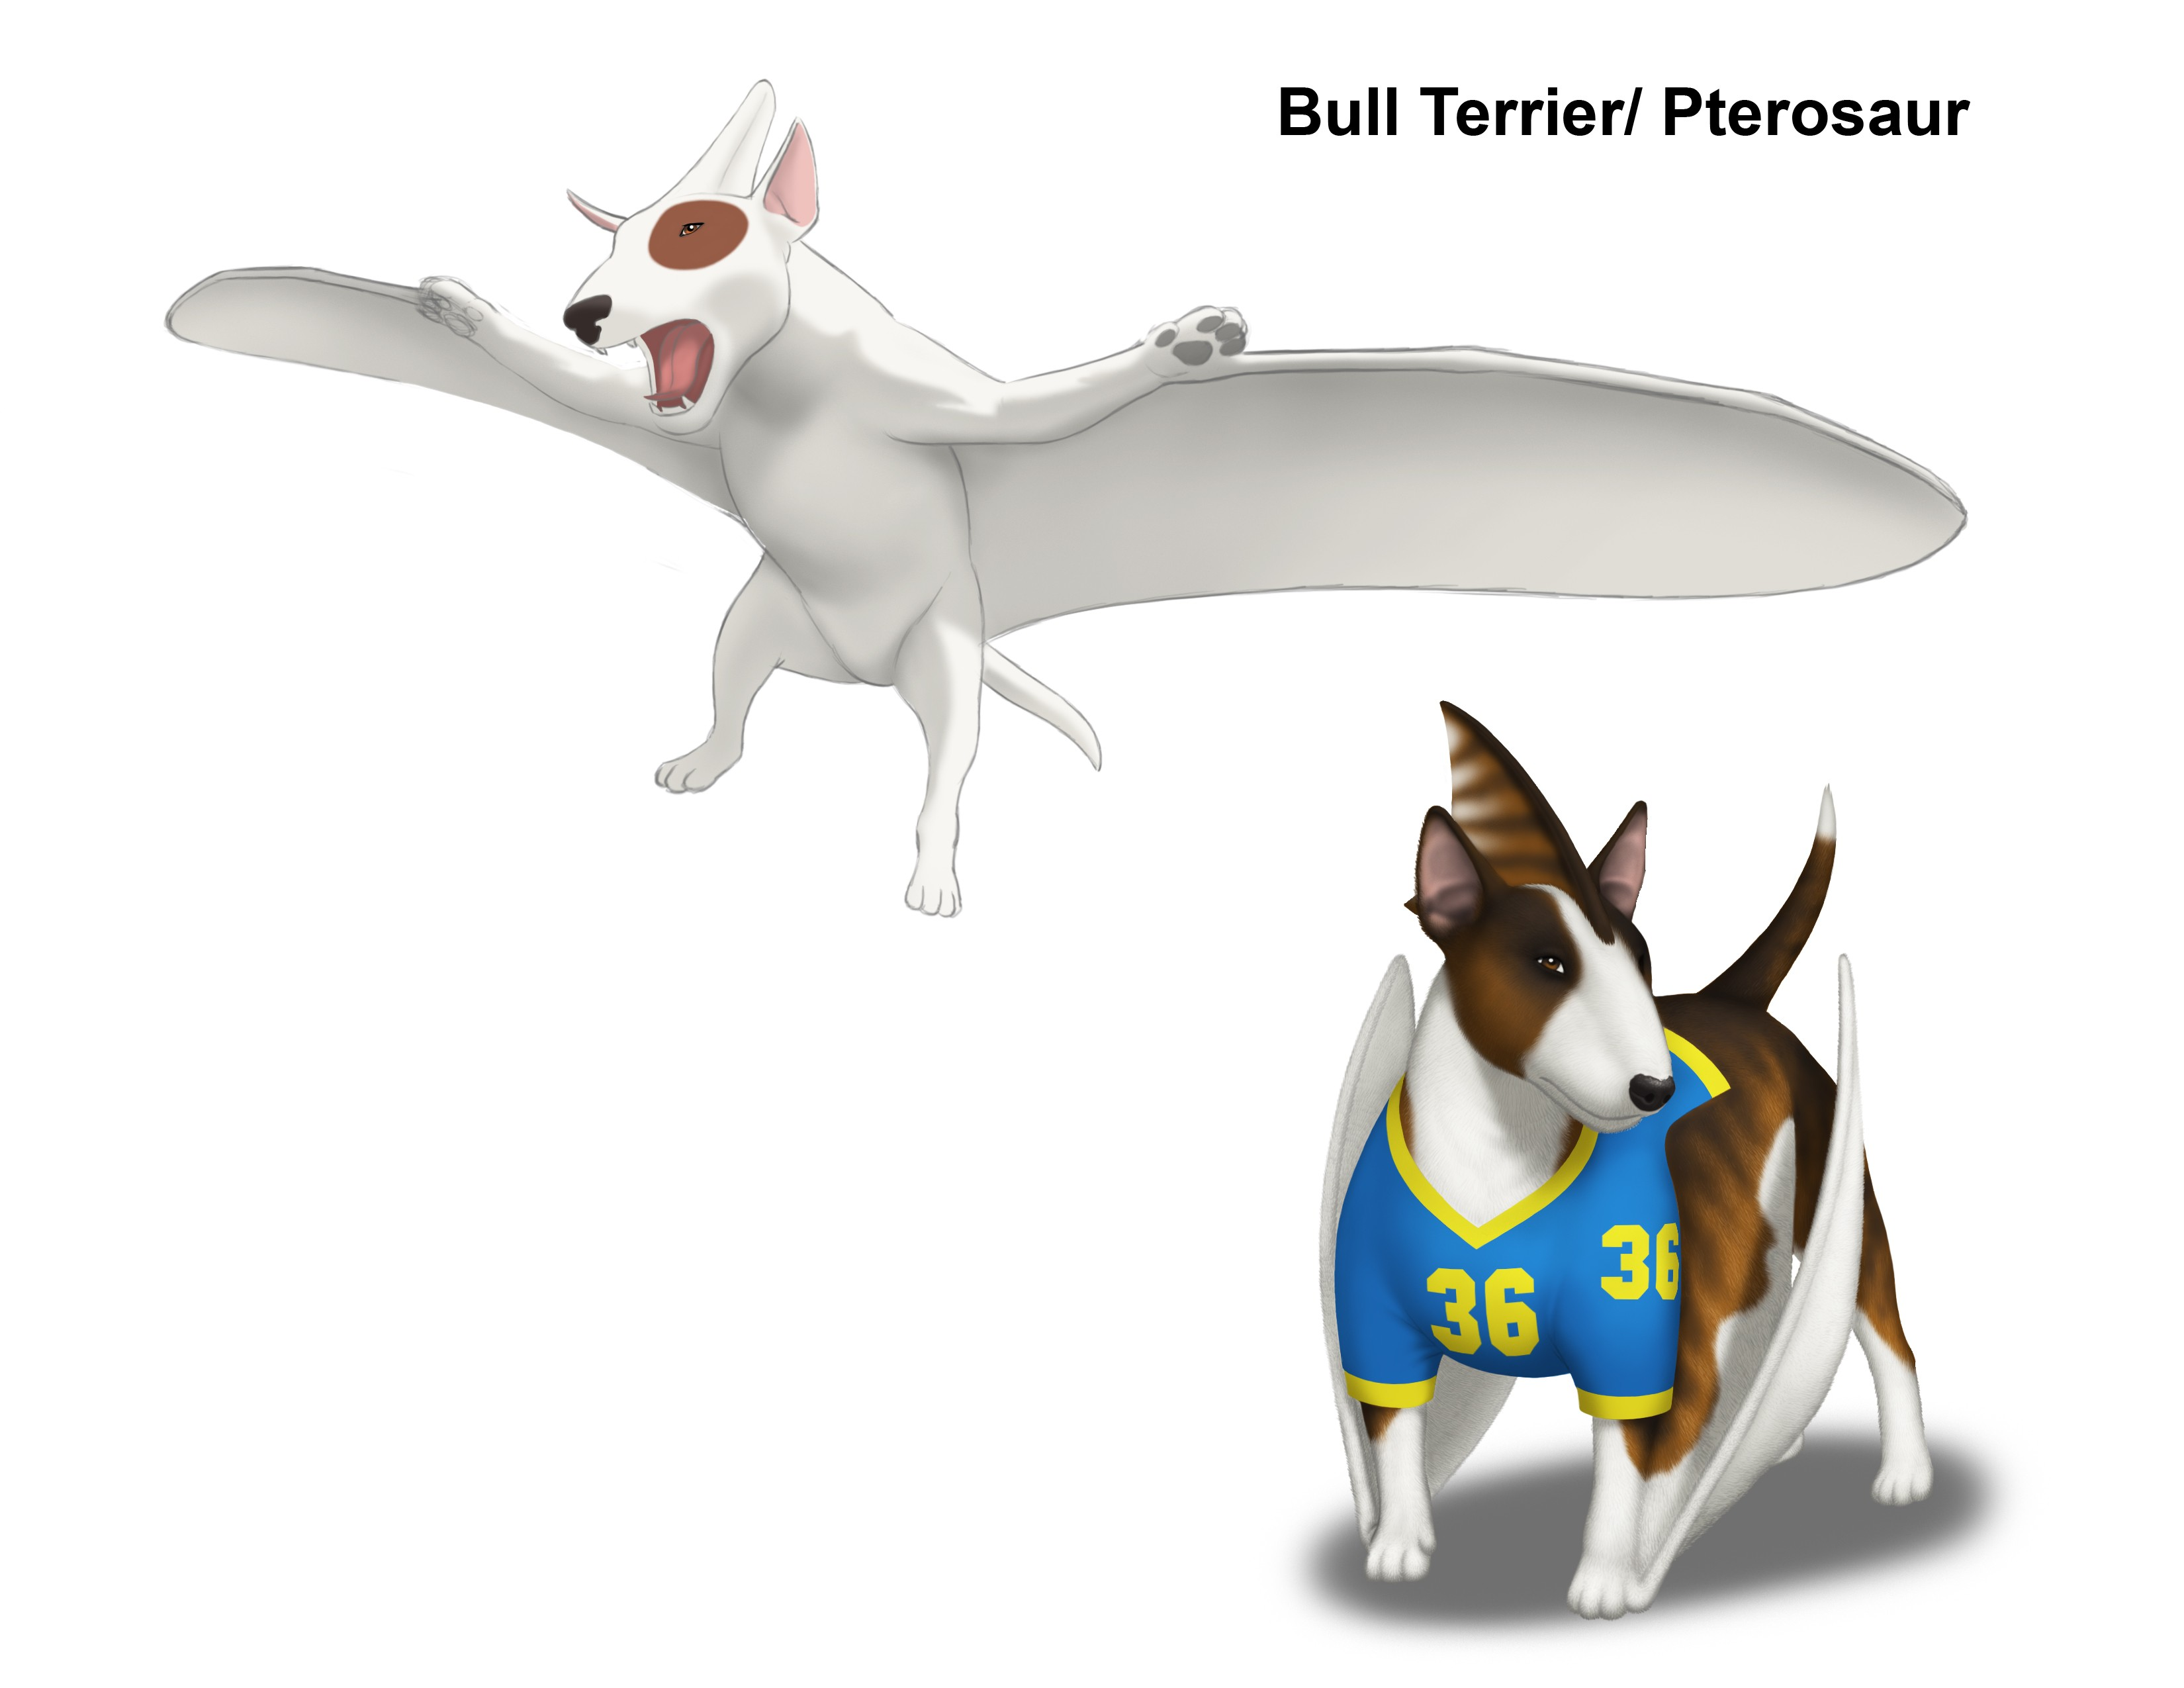 UPCOMING - DINO-DOGS FOOTBALL VR starring MARSHAWN LYNCH 8b49e27bf